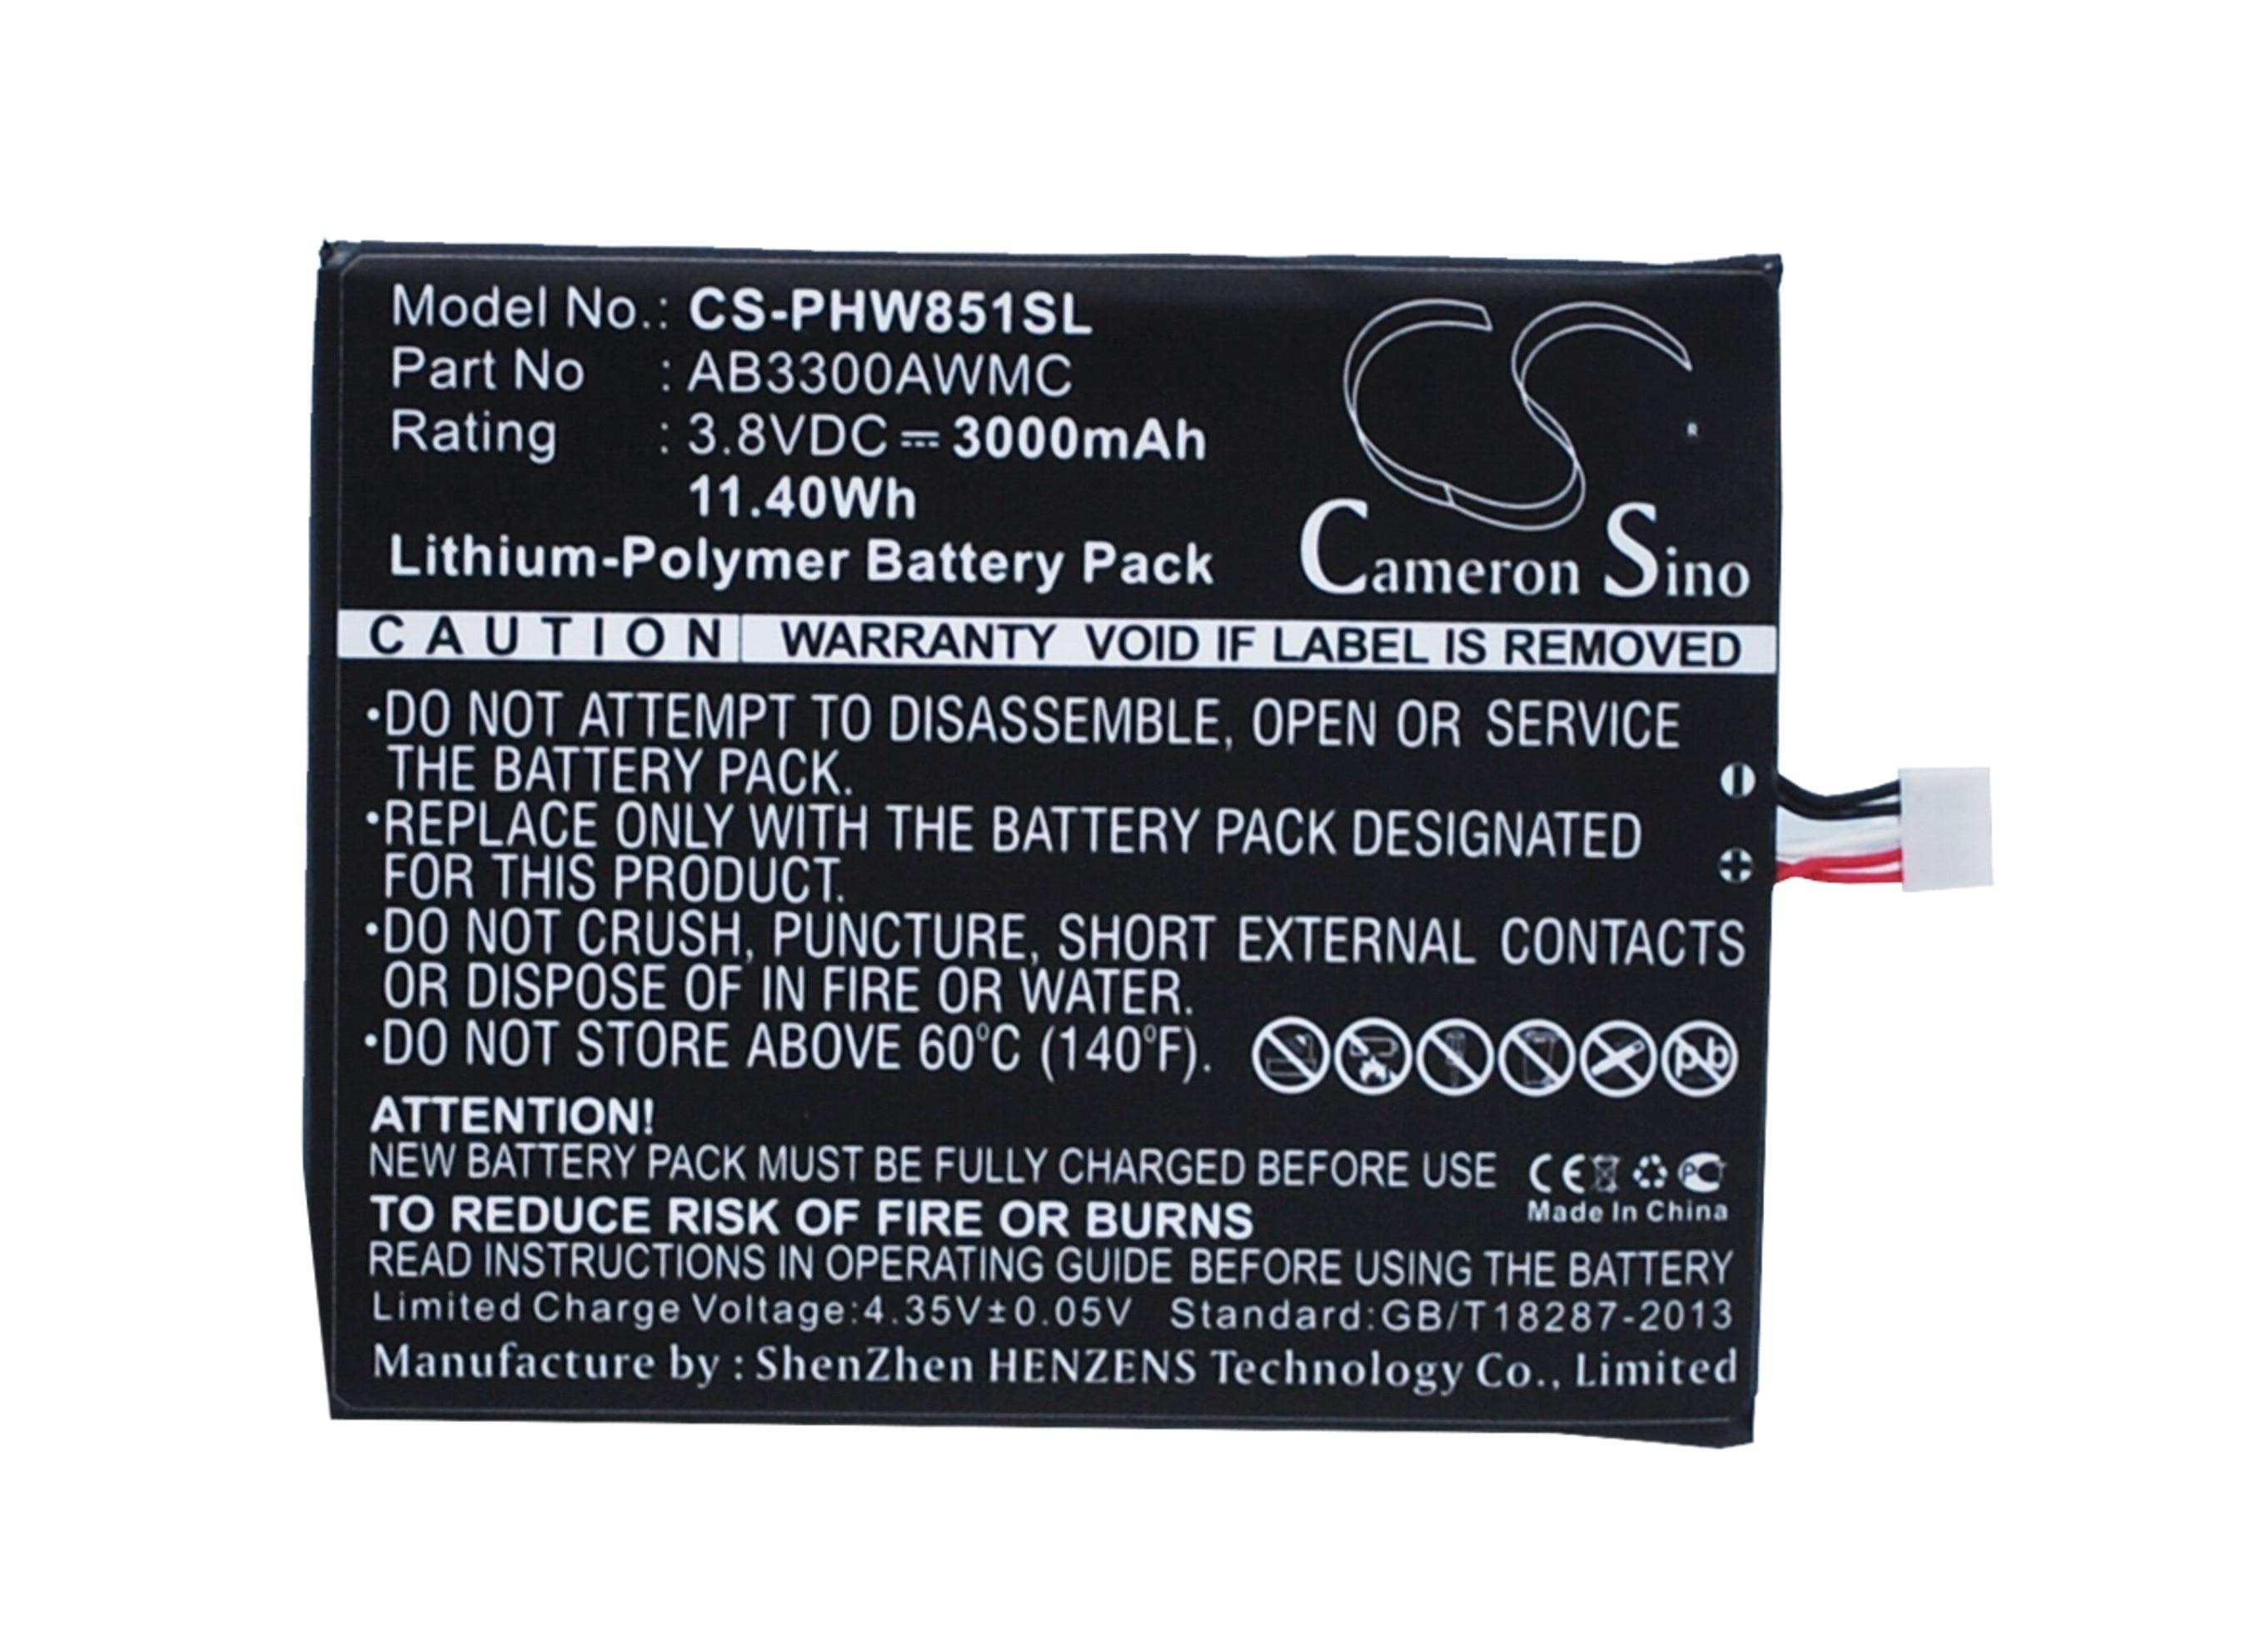 Cameron Sino High Quality 3000mAh Battery AB3300AWMC for Philips W8510, Xenium W8510